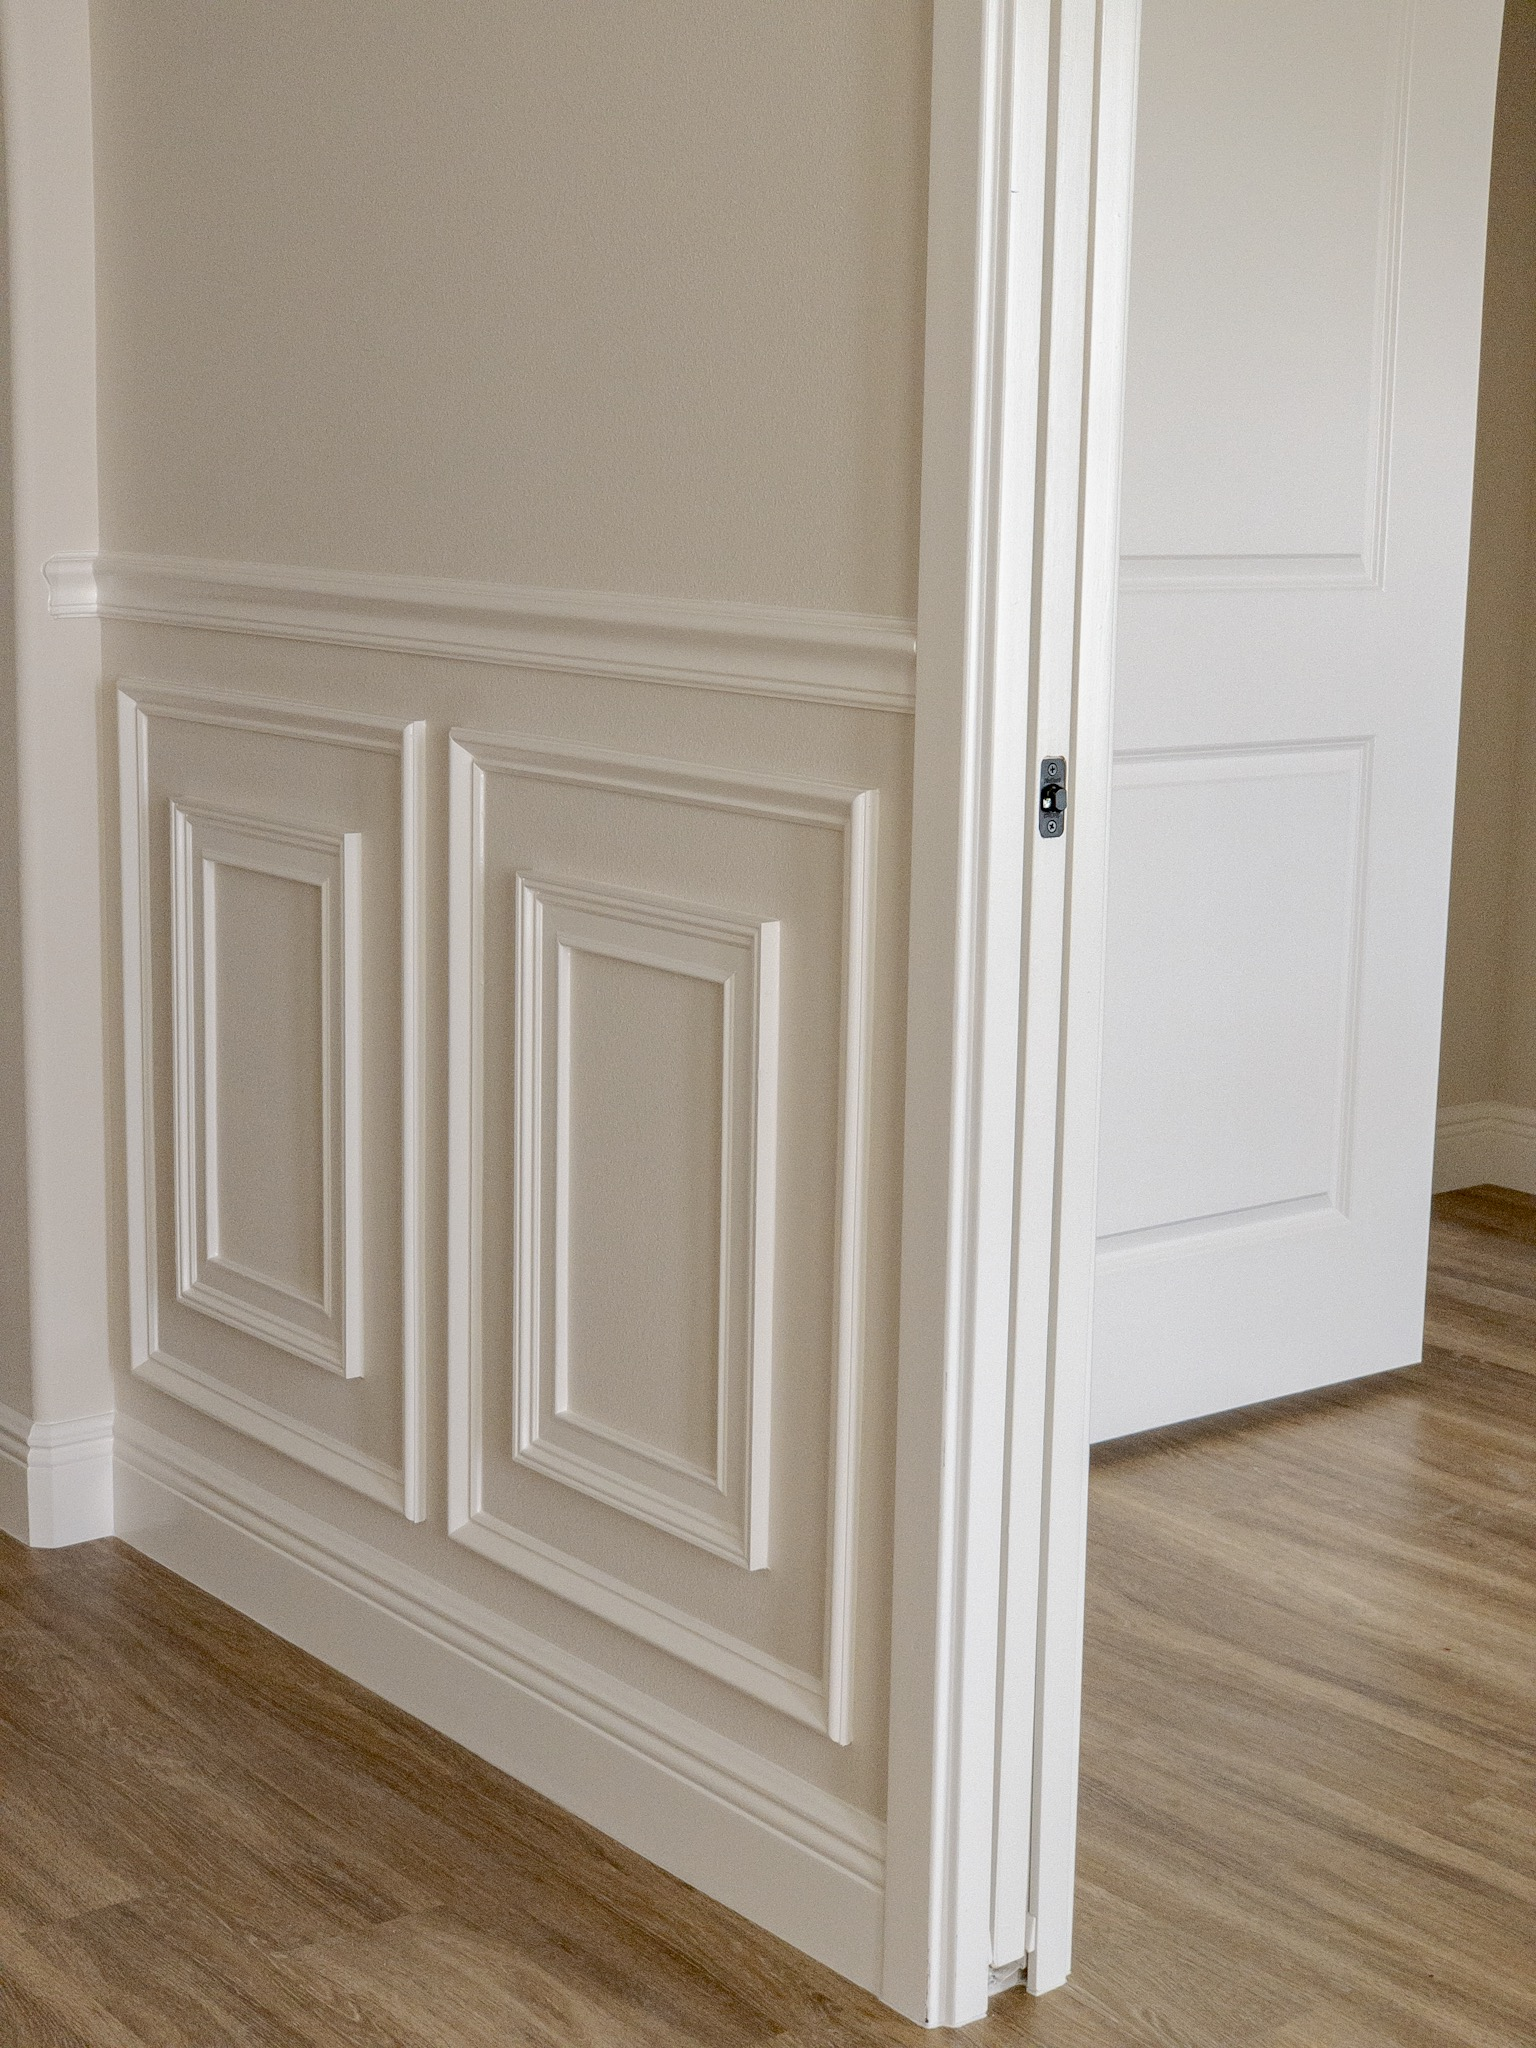 Entry custom woodwork in entry.jpg